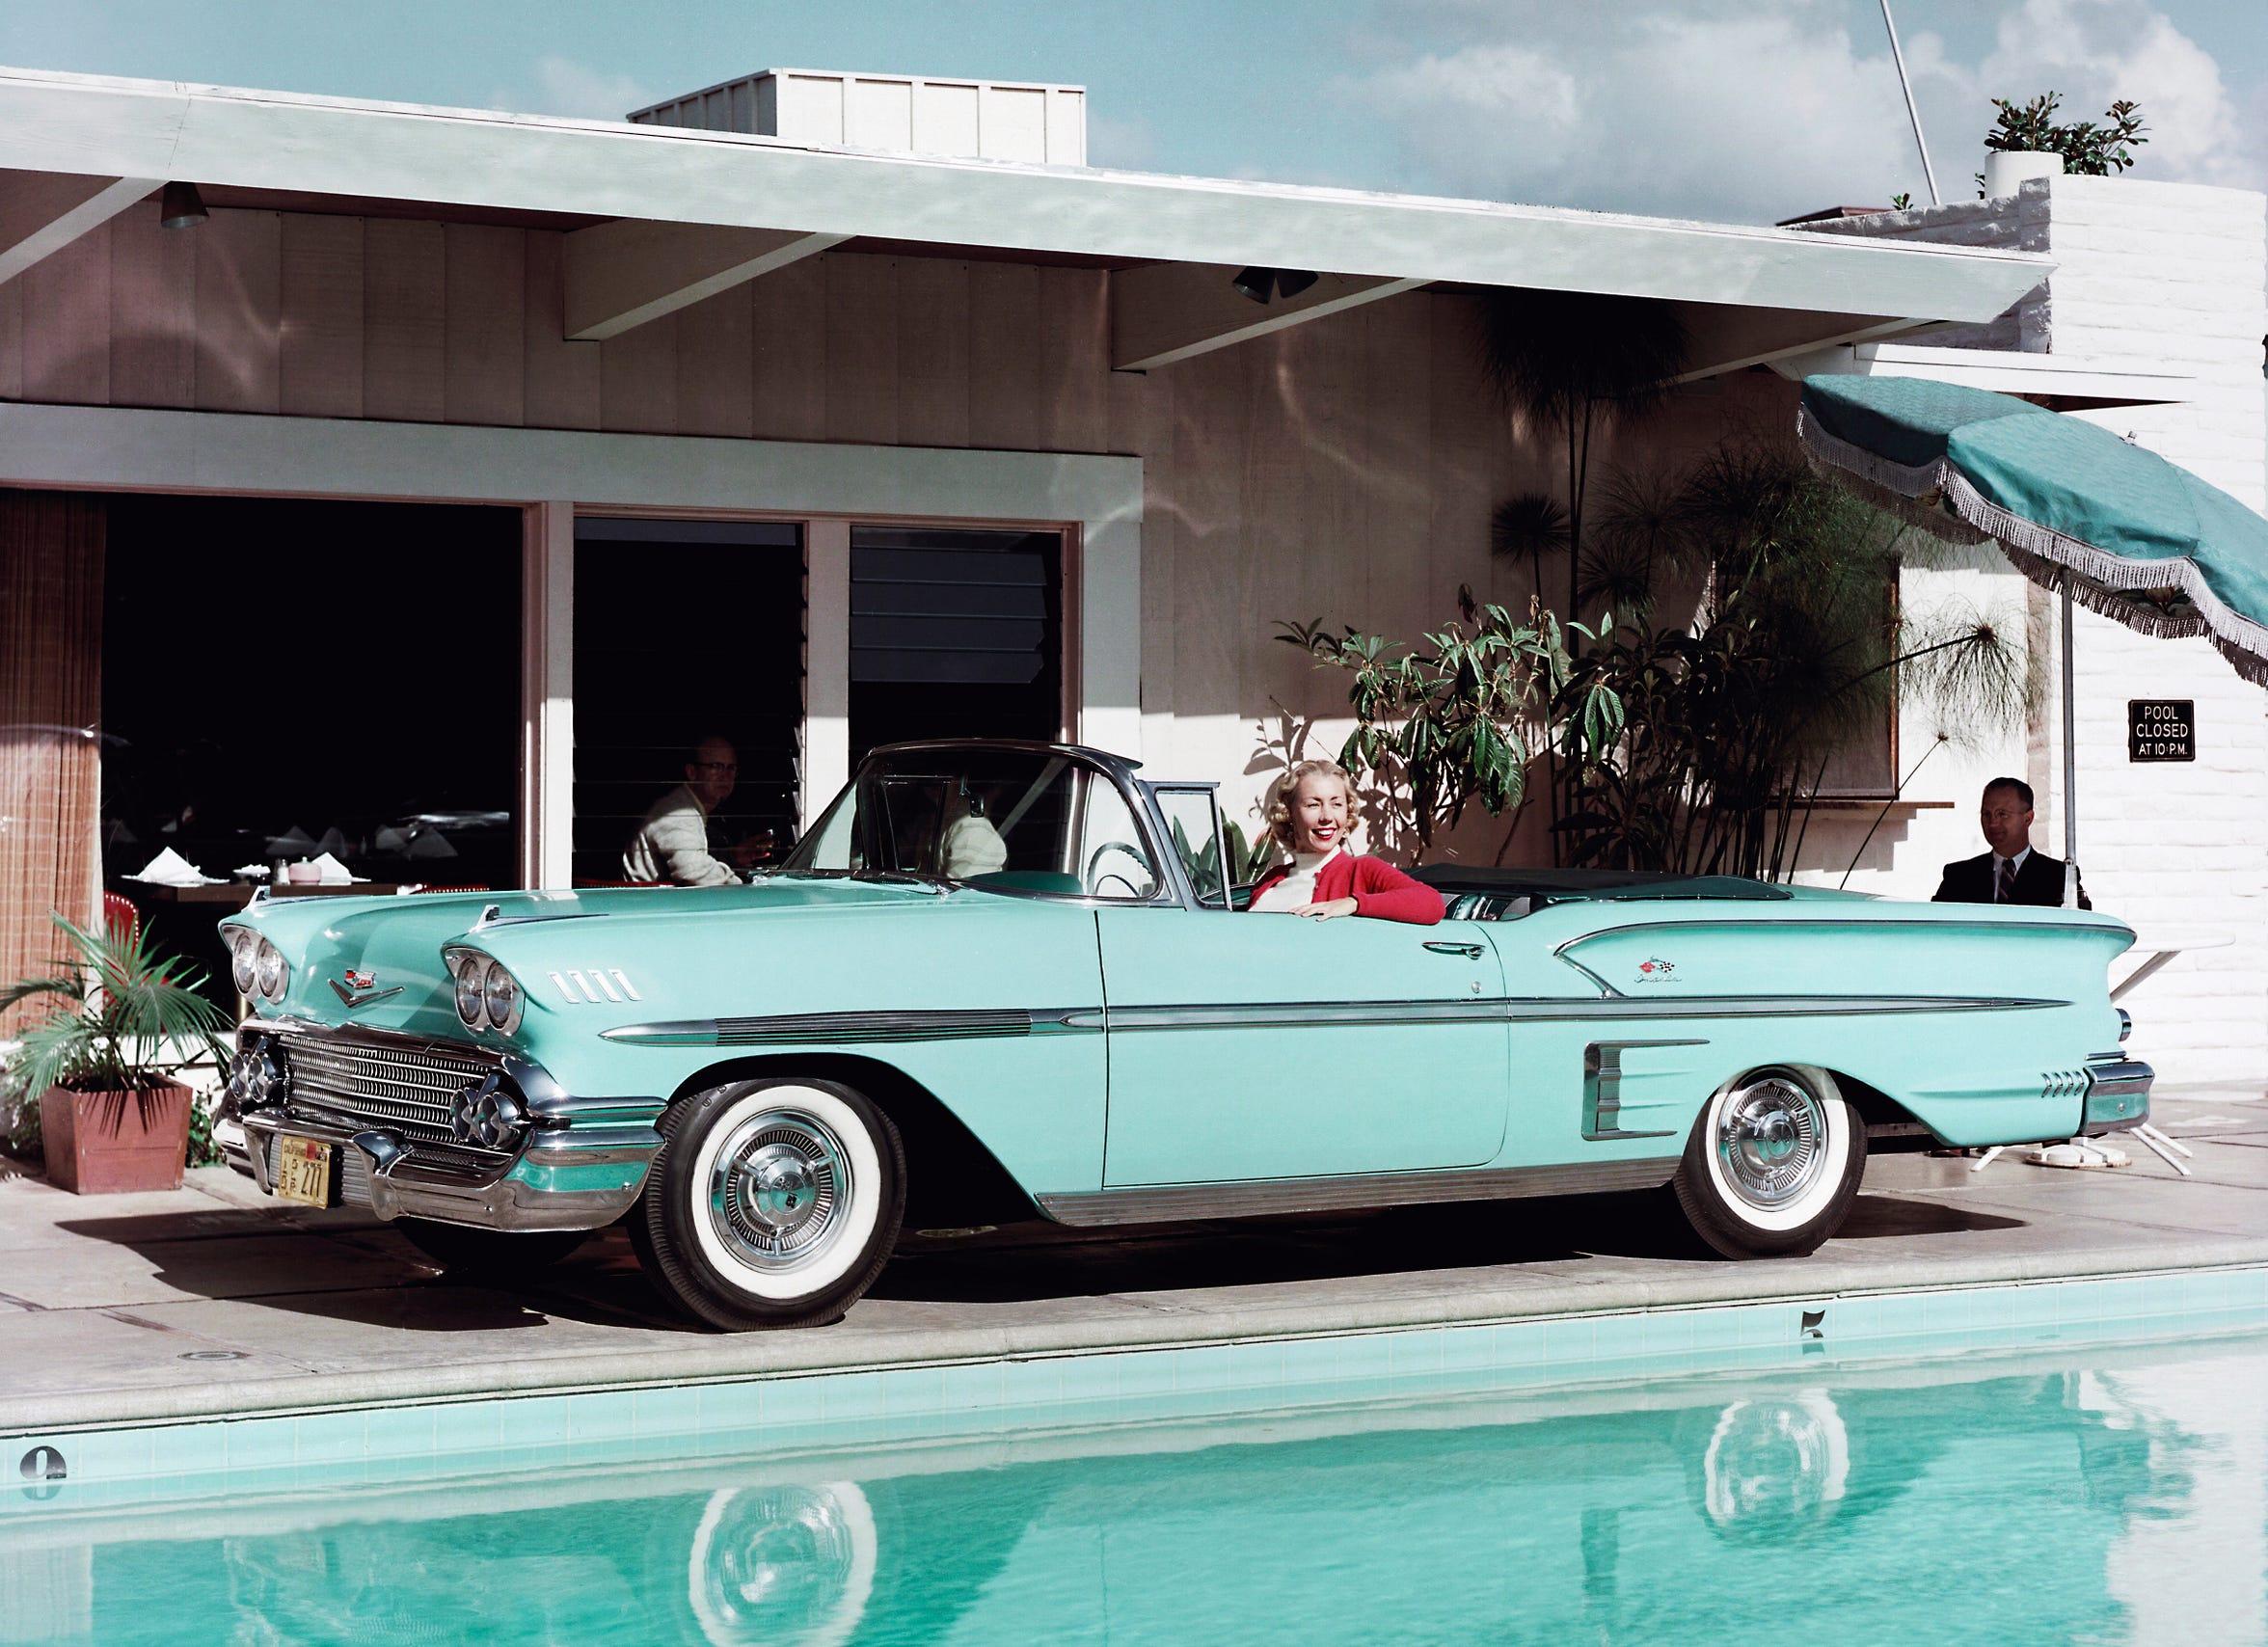 1958 Chevrolet Bel Air Impala Convertible